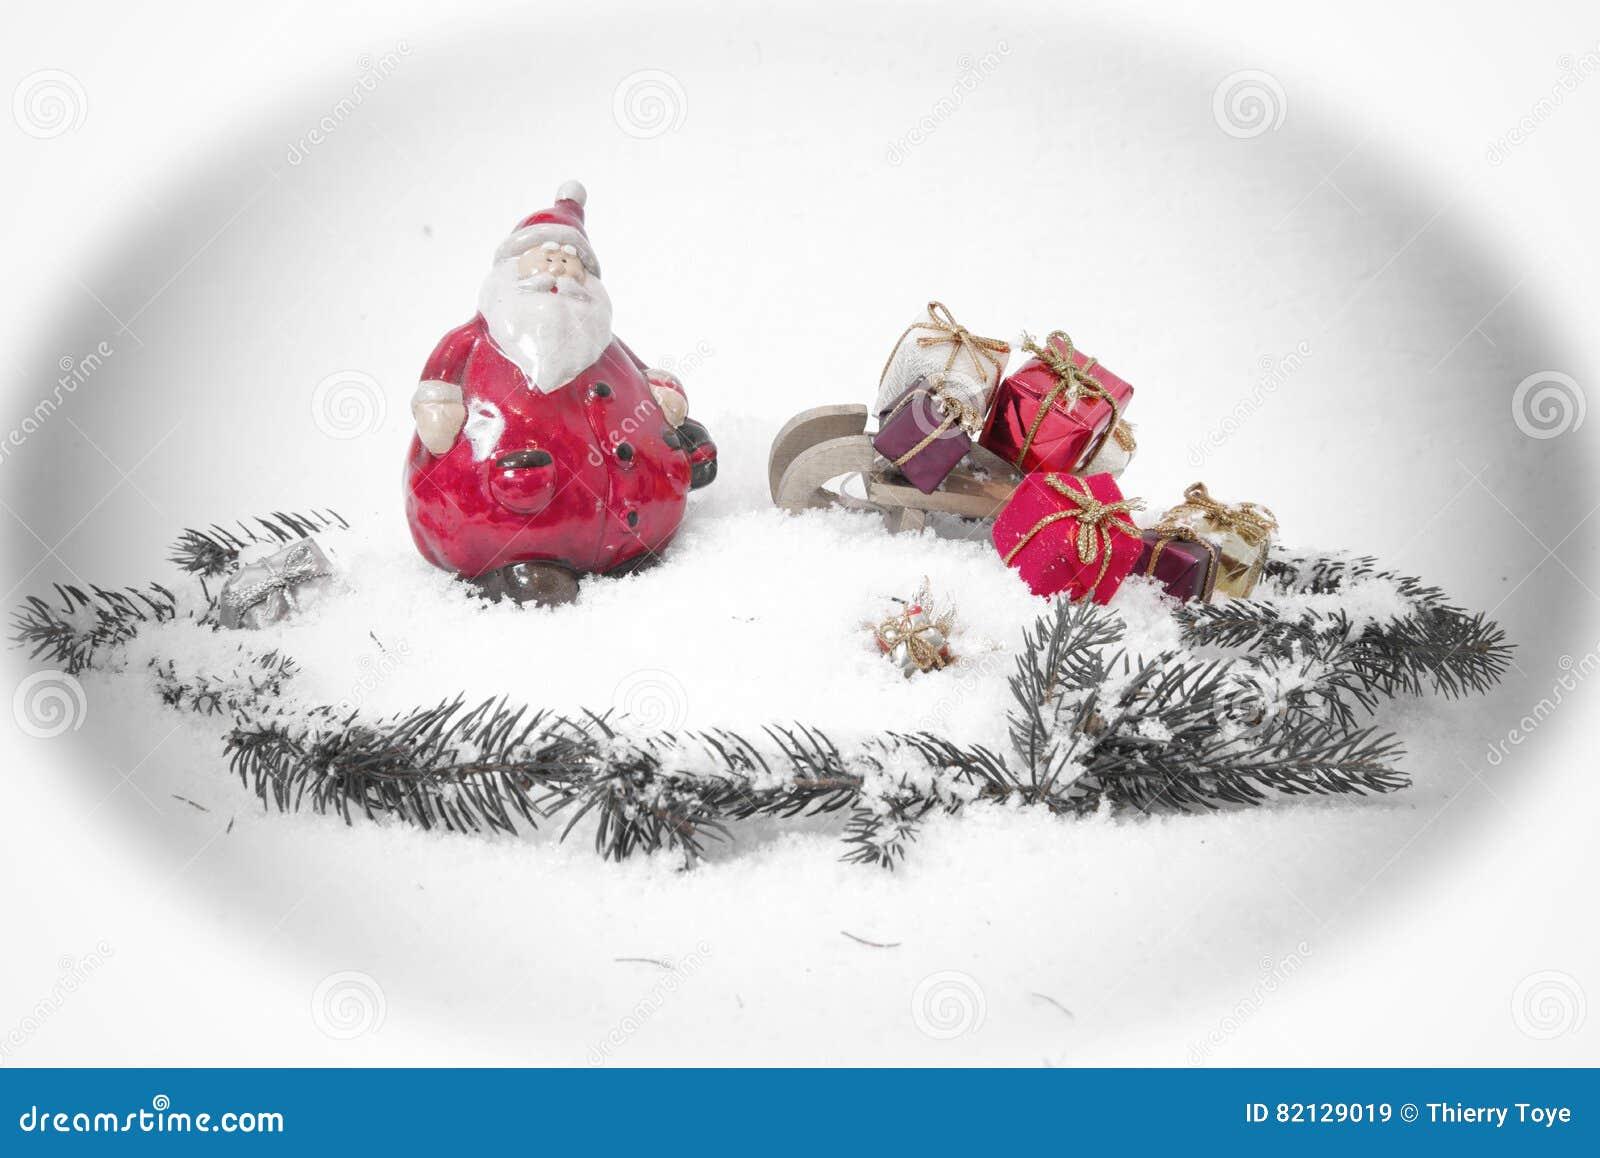 Christmas Time And Gifts Christmas Card Stock Image Image Of Here